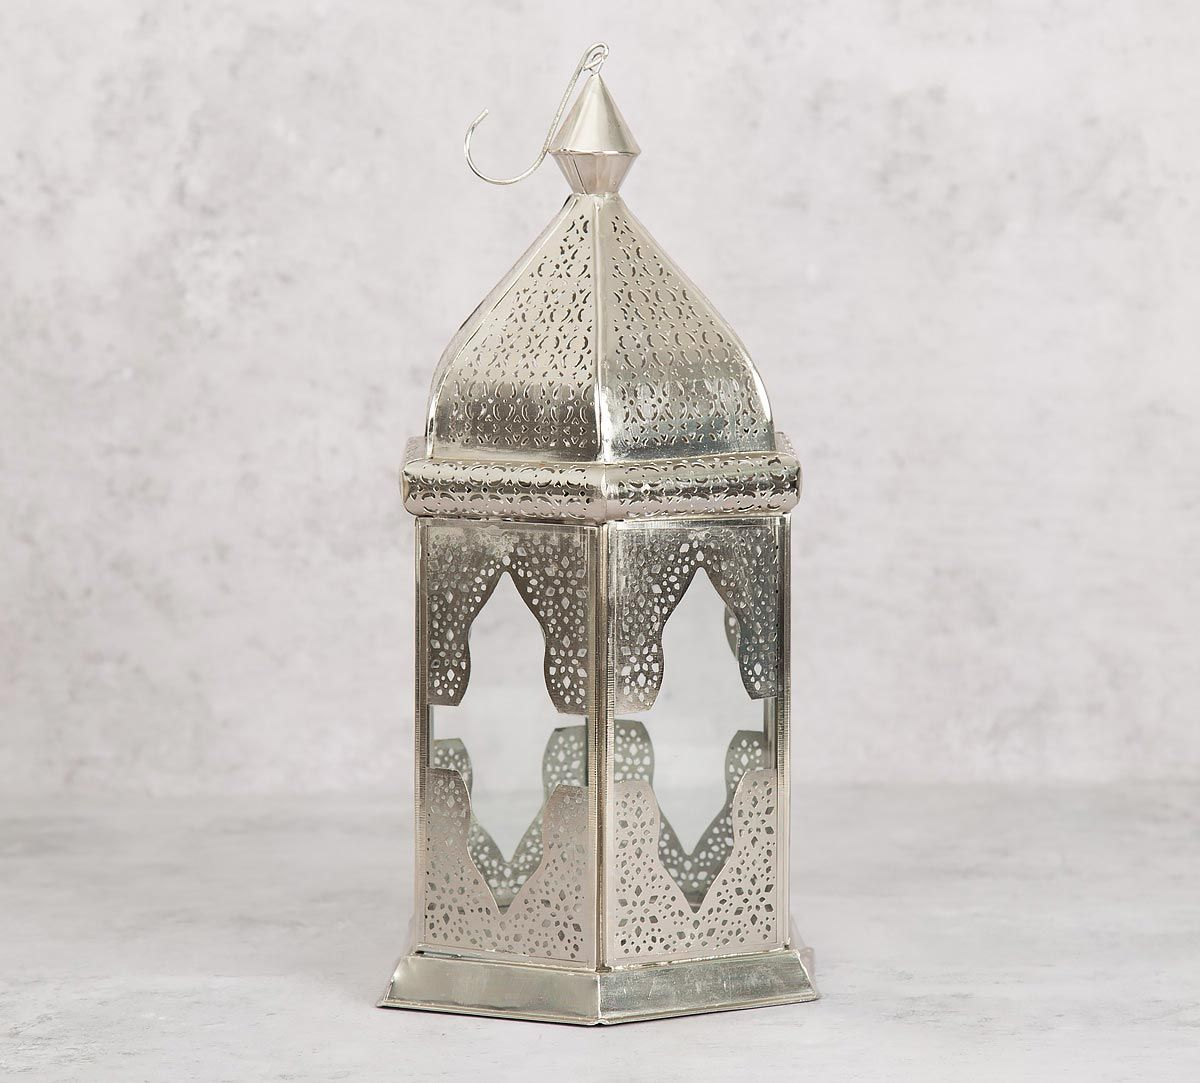 India Circus Octet Starred Decorative Lantern